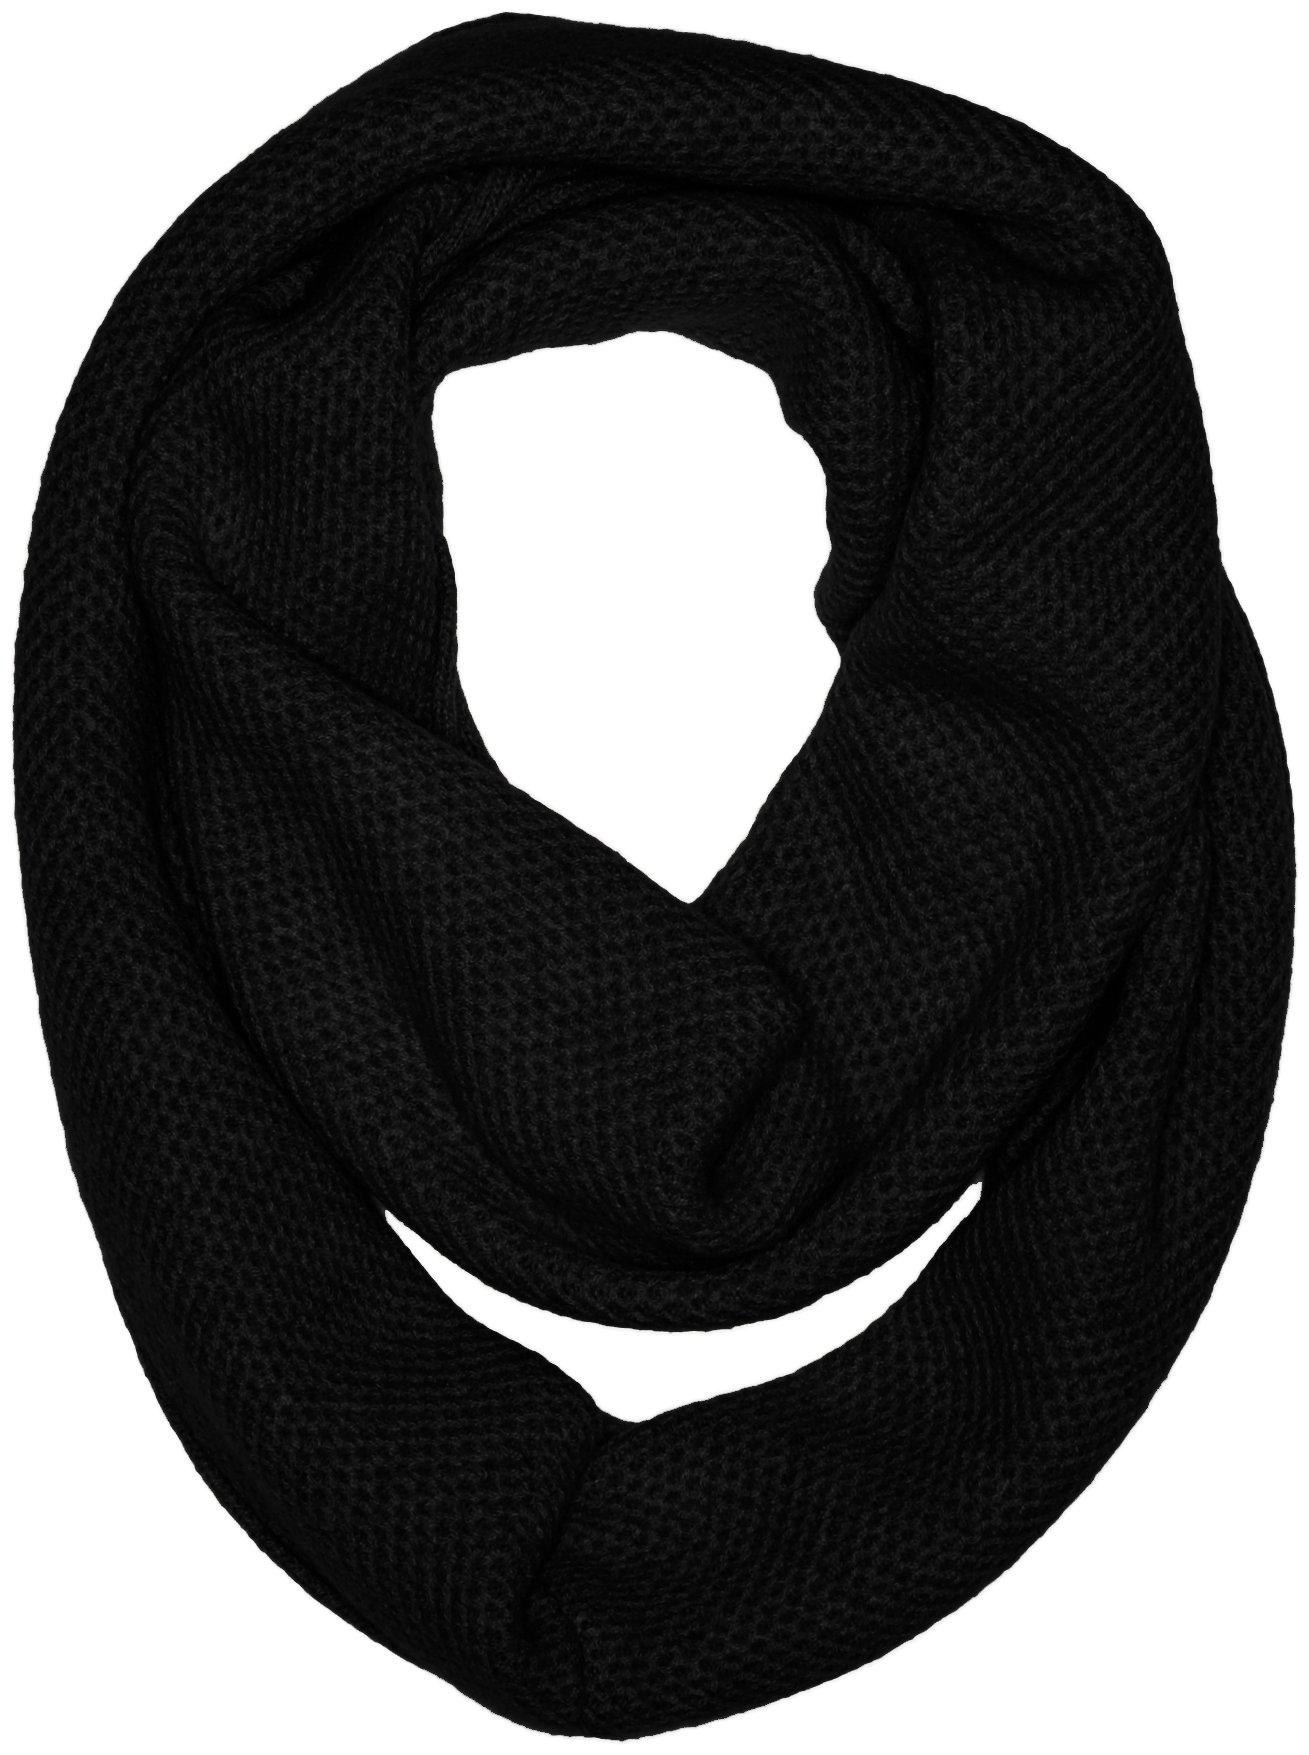 Sofia Cashmere Women's 100 Percent Cashmere Honeycomb Infinity Scarf, Black, One